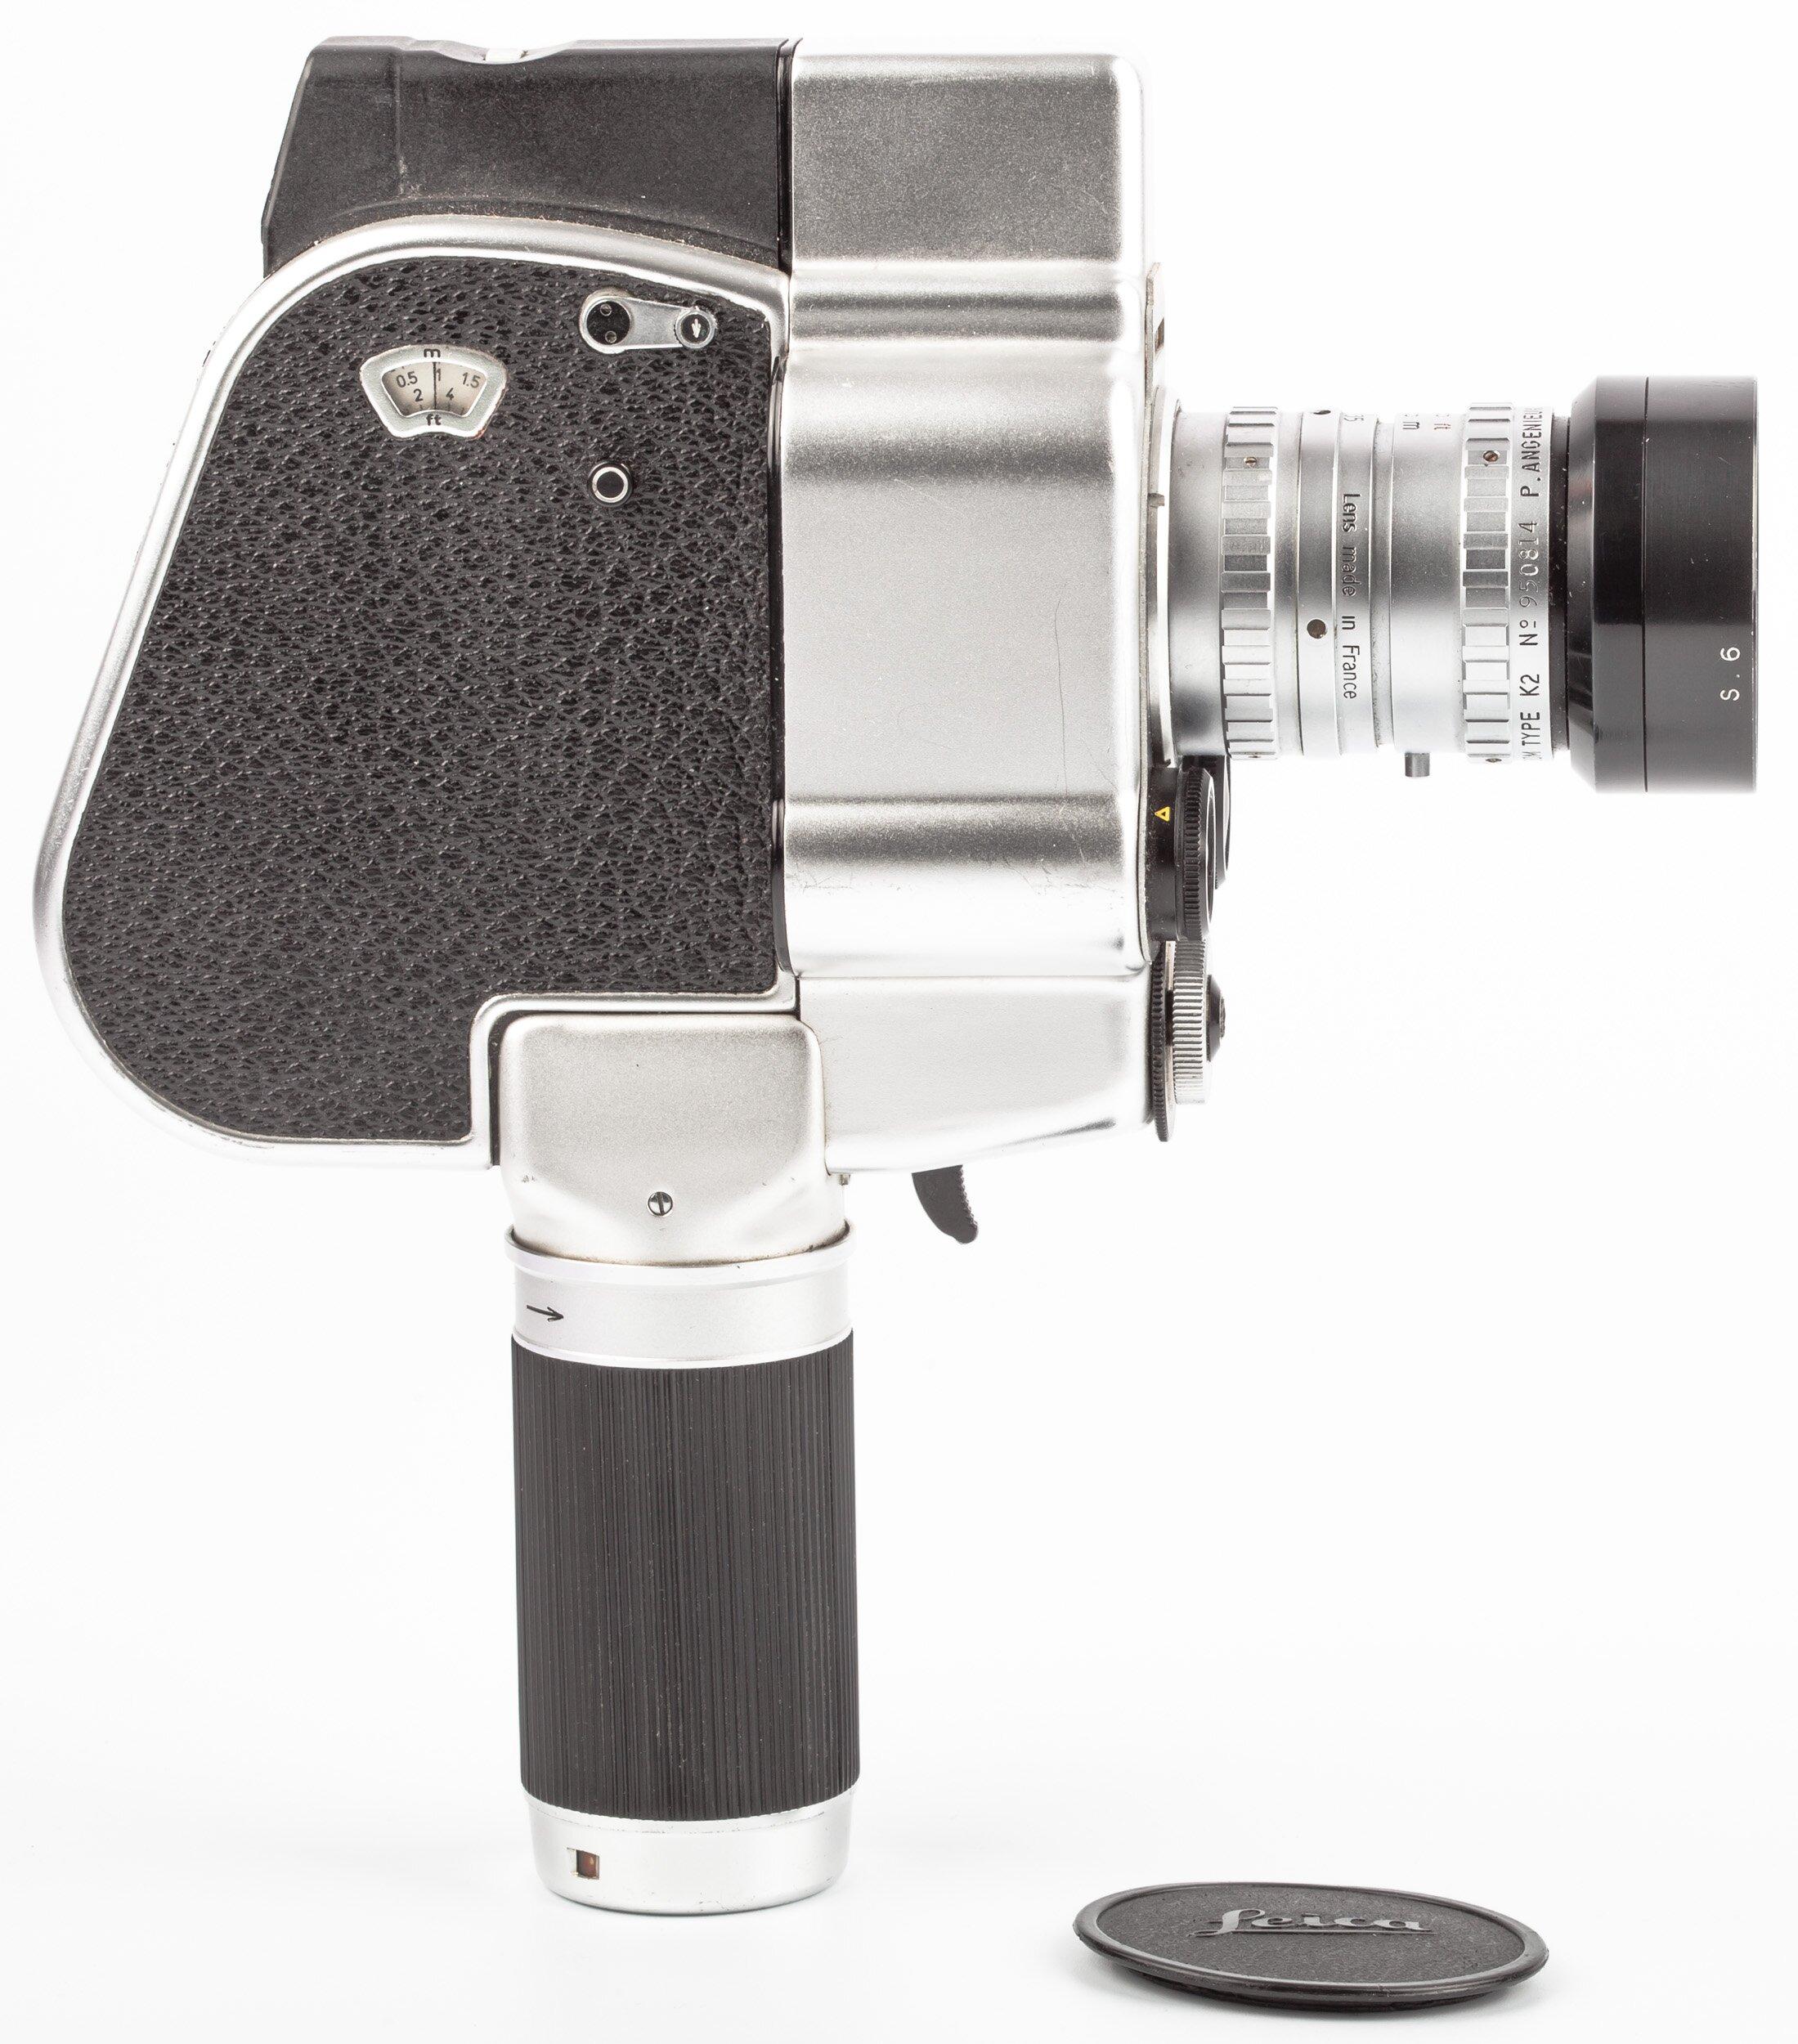 Carena Zoomex mit Angenieux 1,8/7,5-35mm